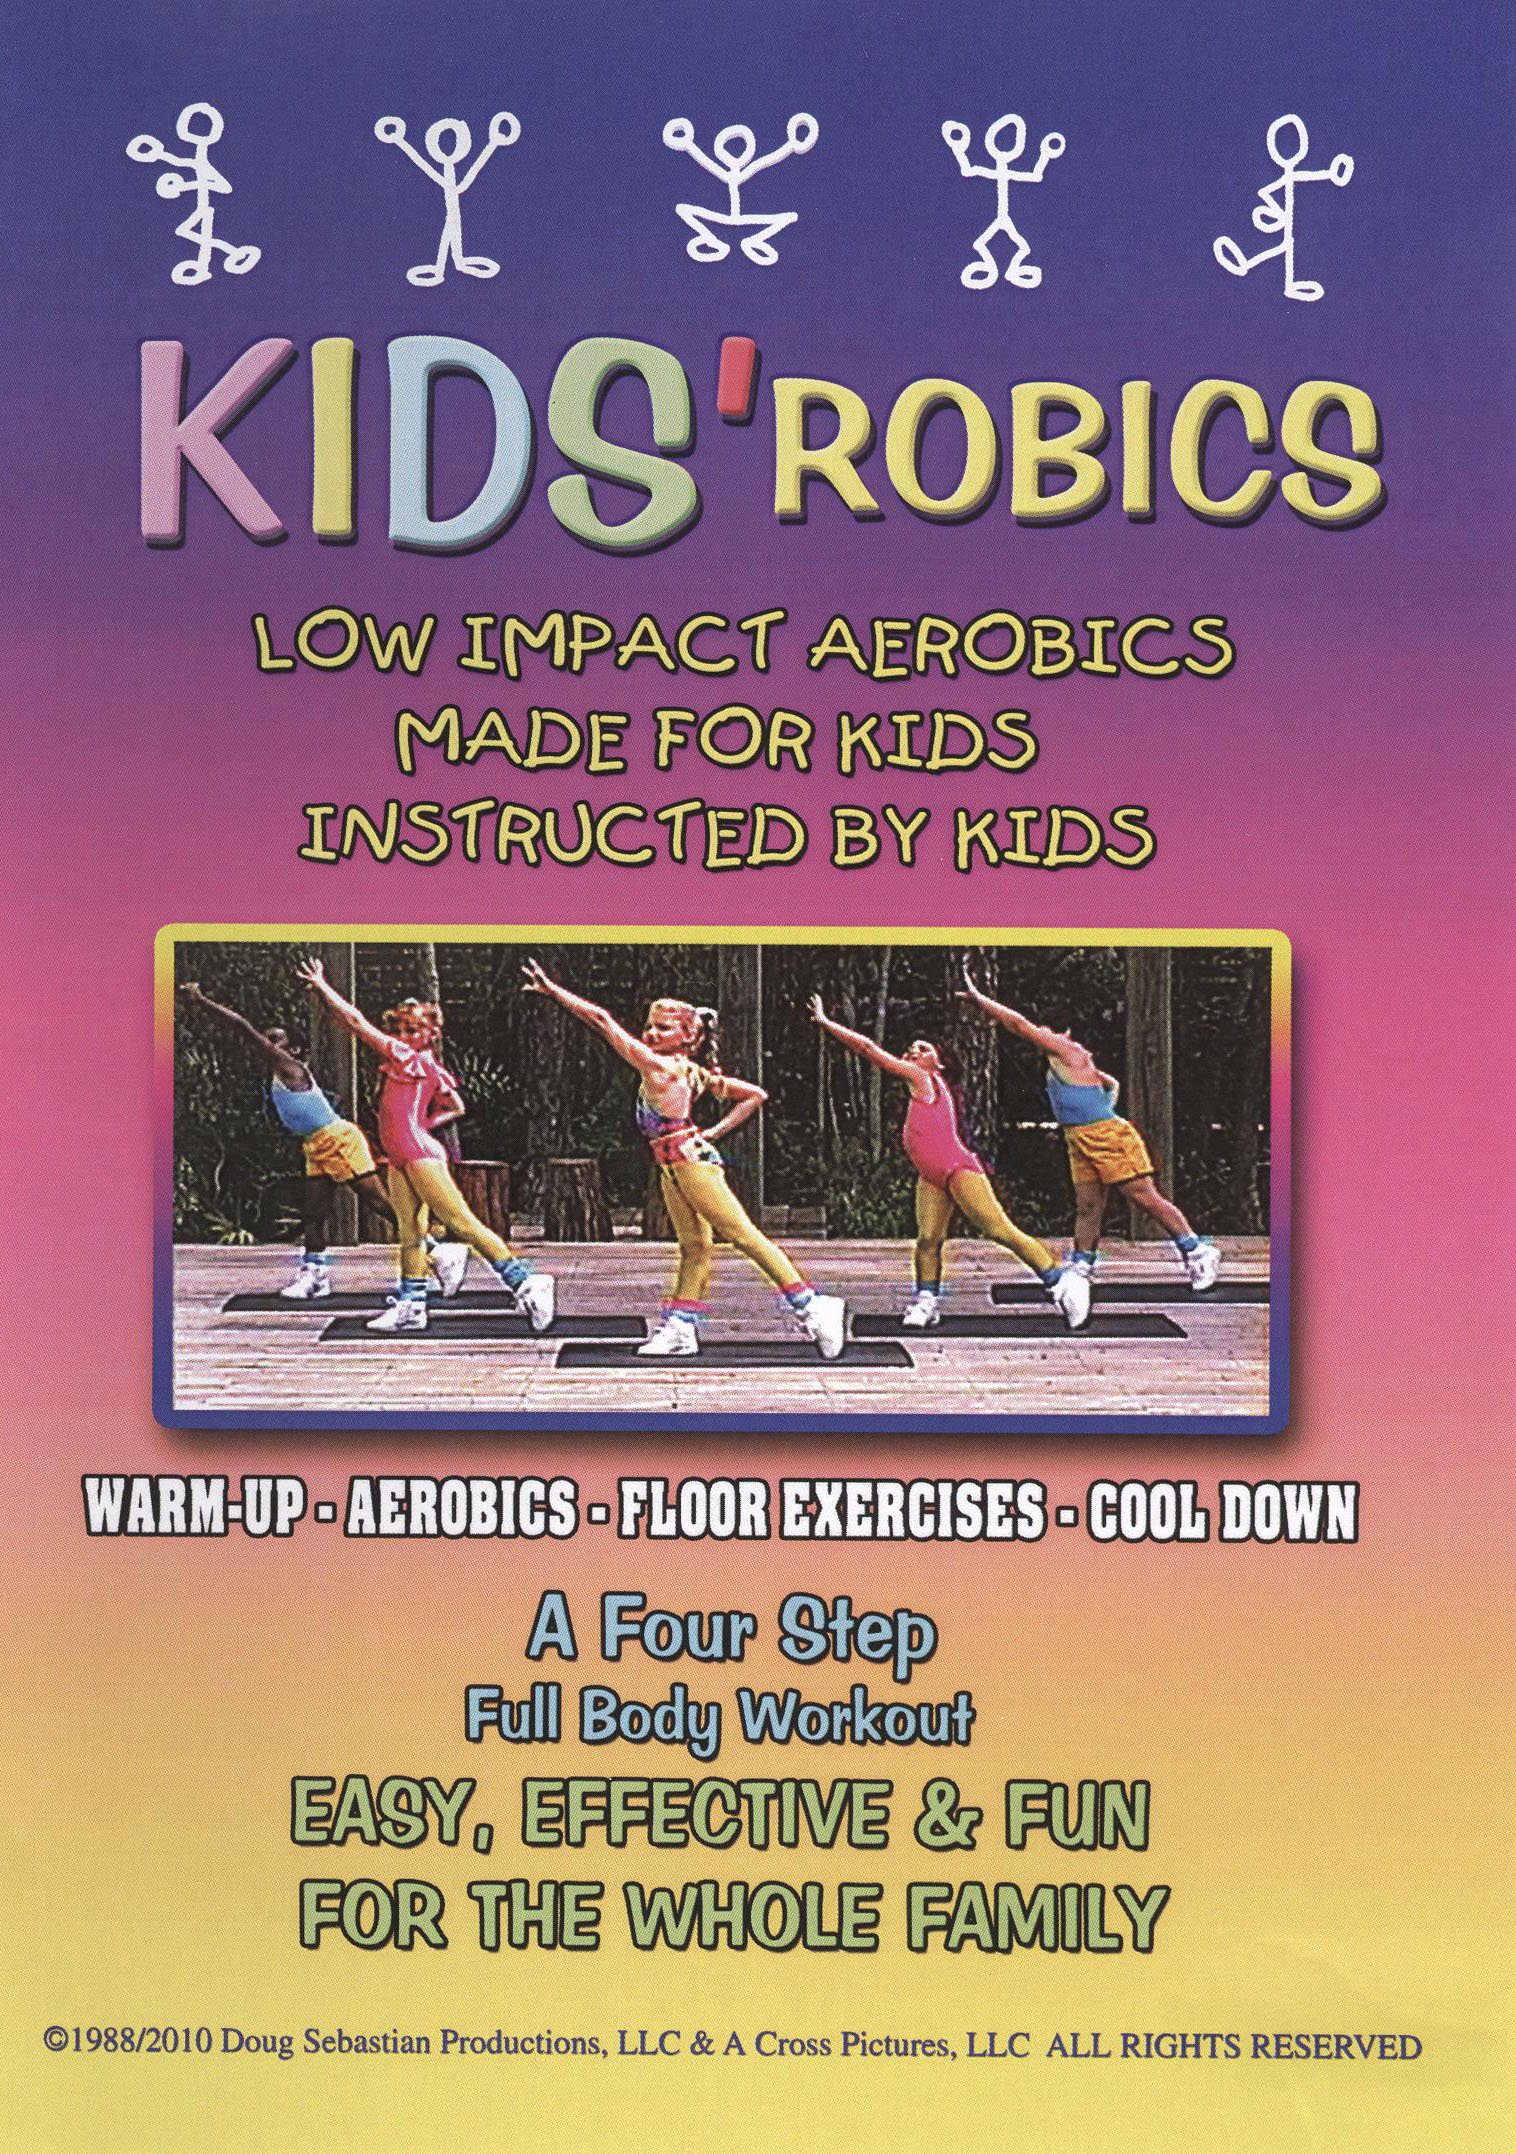 Kids' Robics